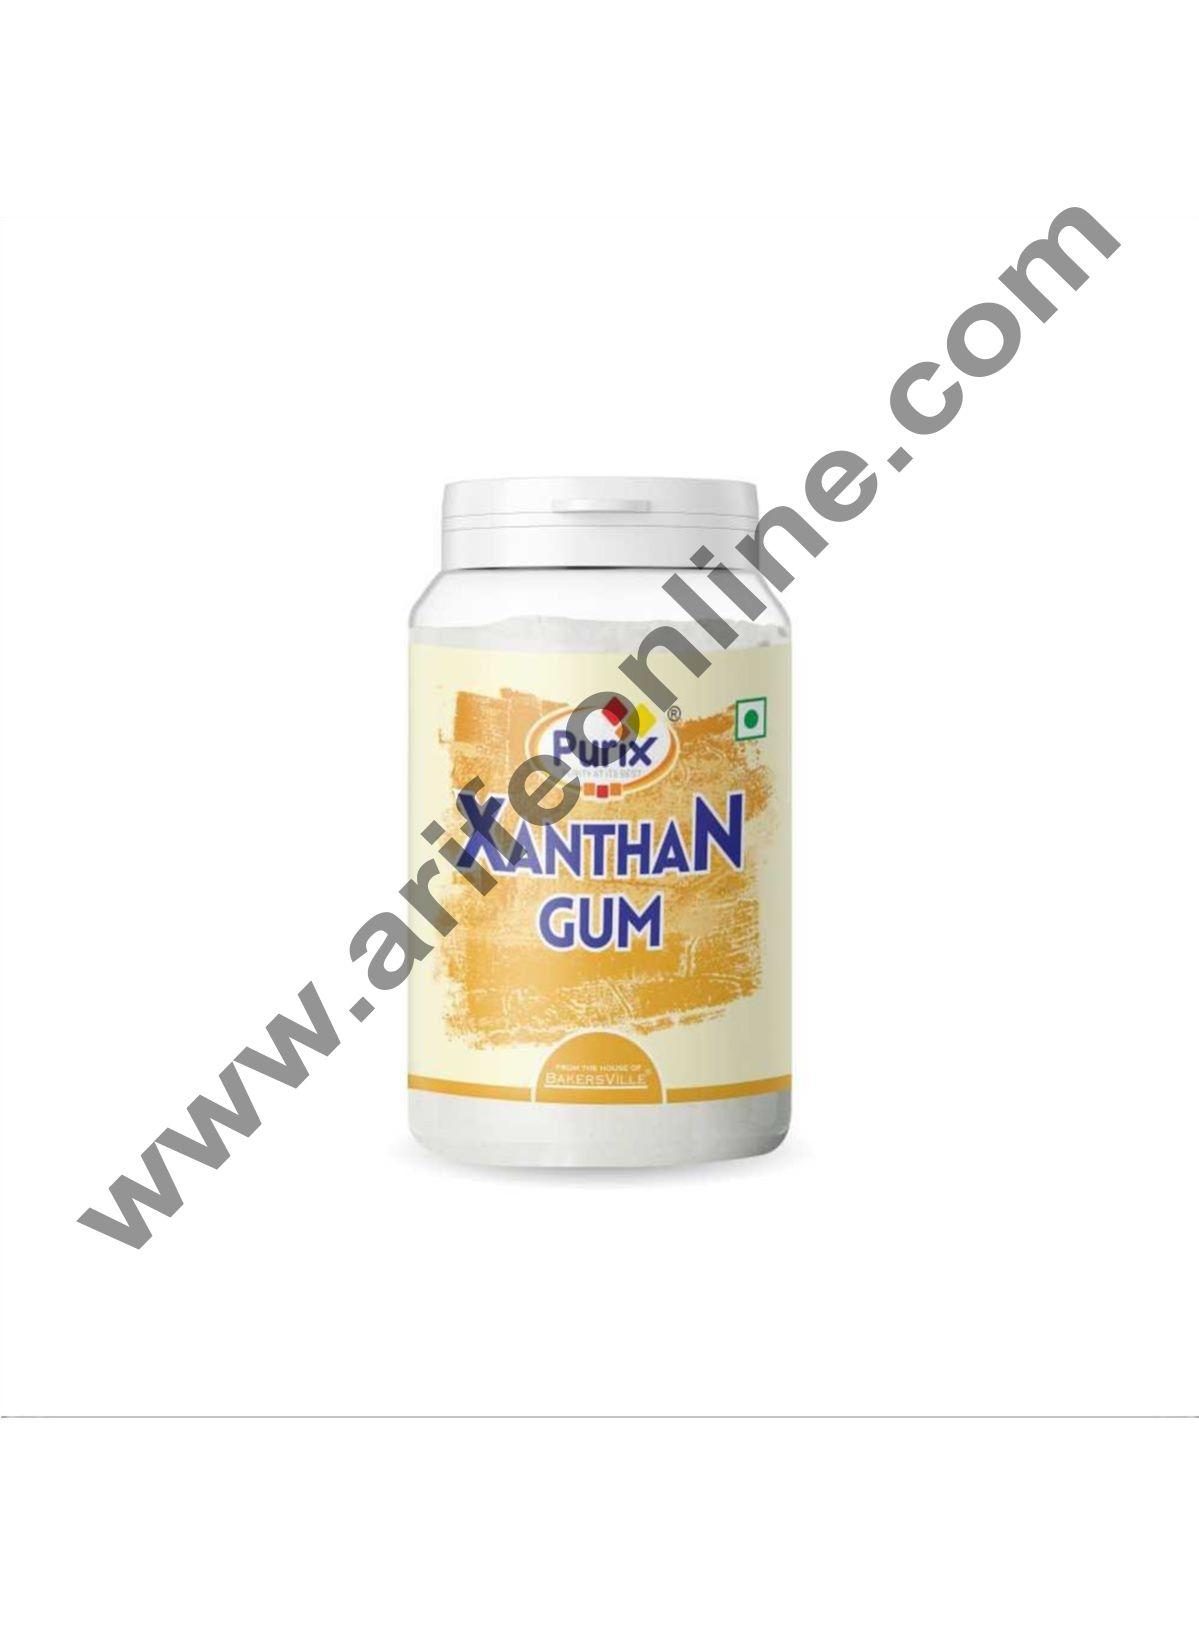 Purix™ Xanthan Gum, 75gm